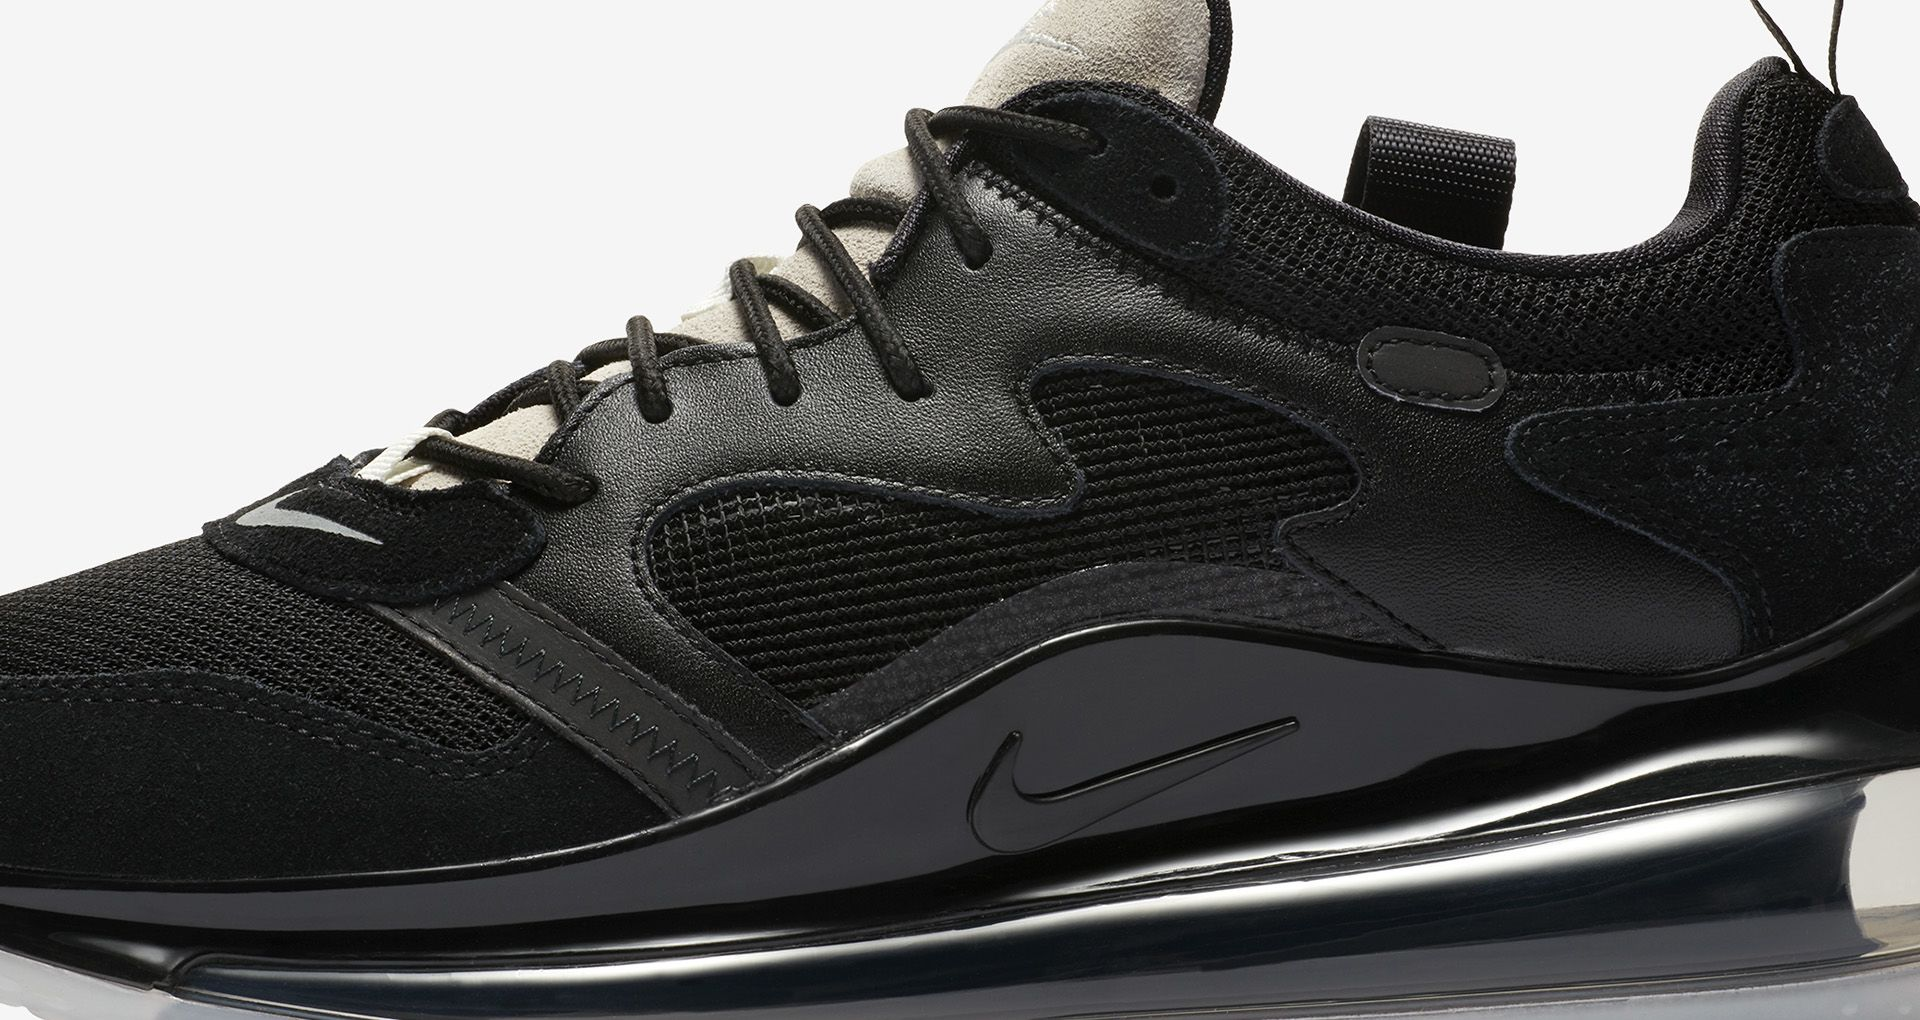 Air Max 720 x OBJ 'BlackRed Orbit' Release Date. Nike SNKRS